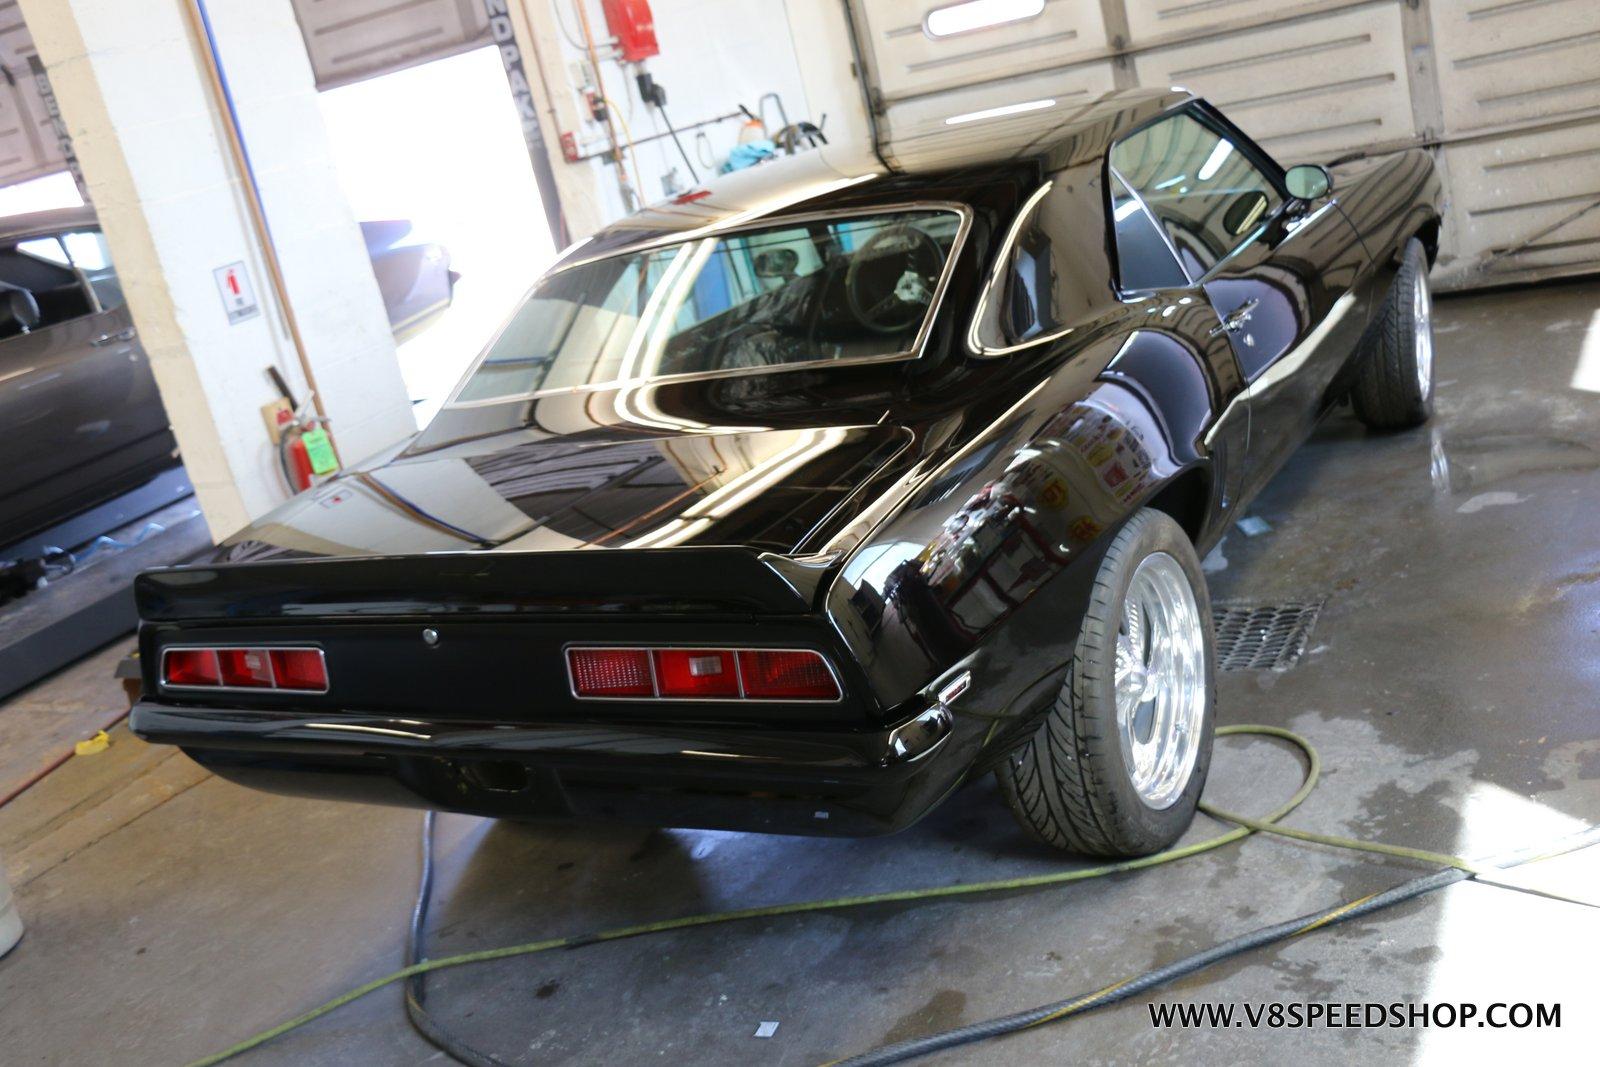 1969 Chevrolet Camaro Sheetmetal, Bodywork, and Paint Photo Gallery